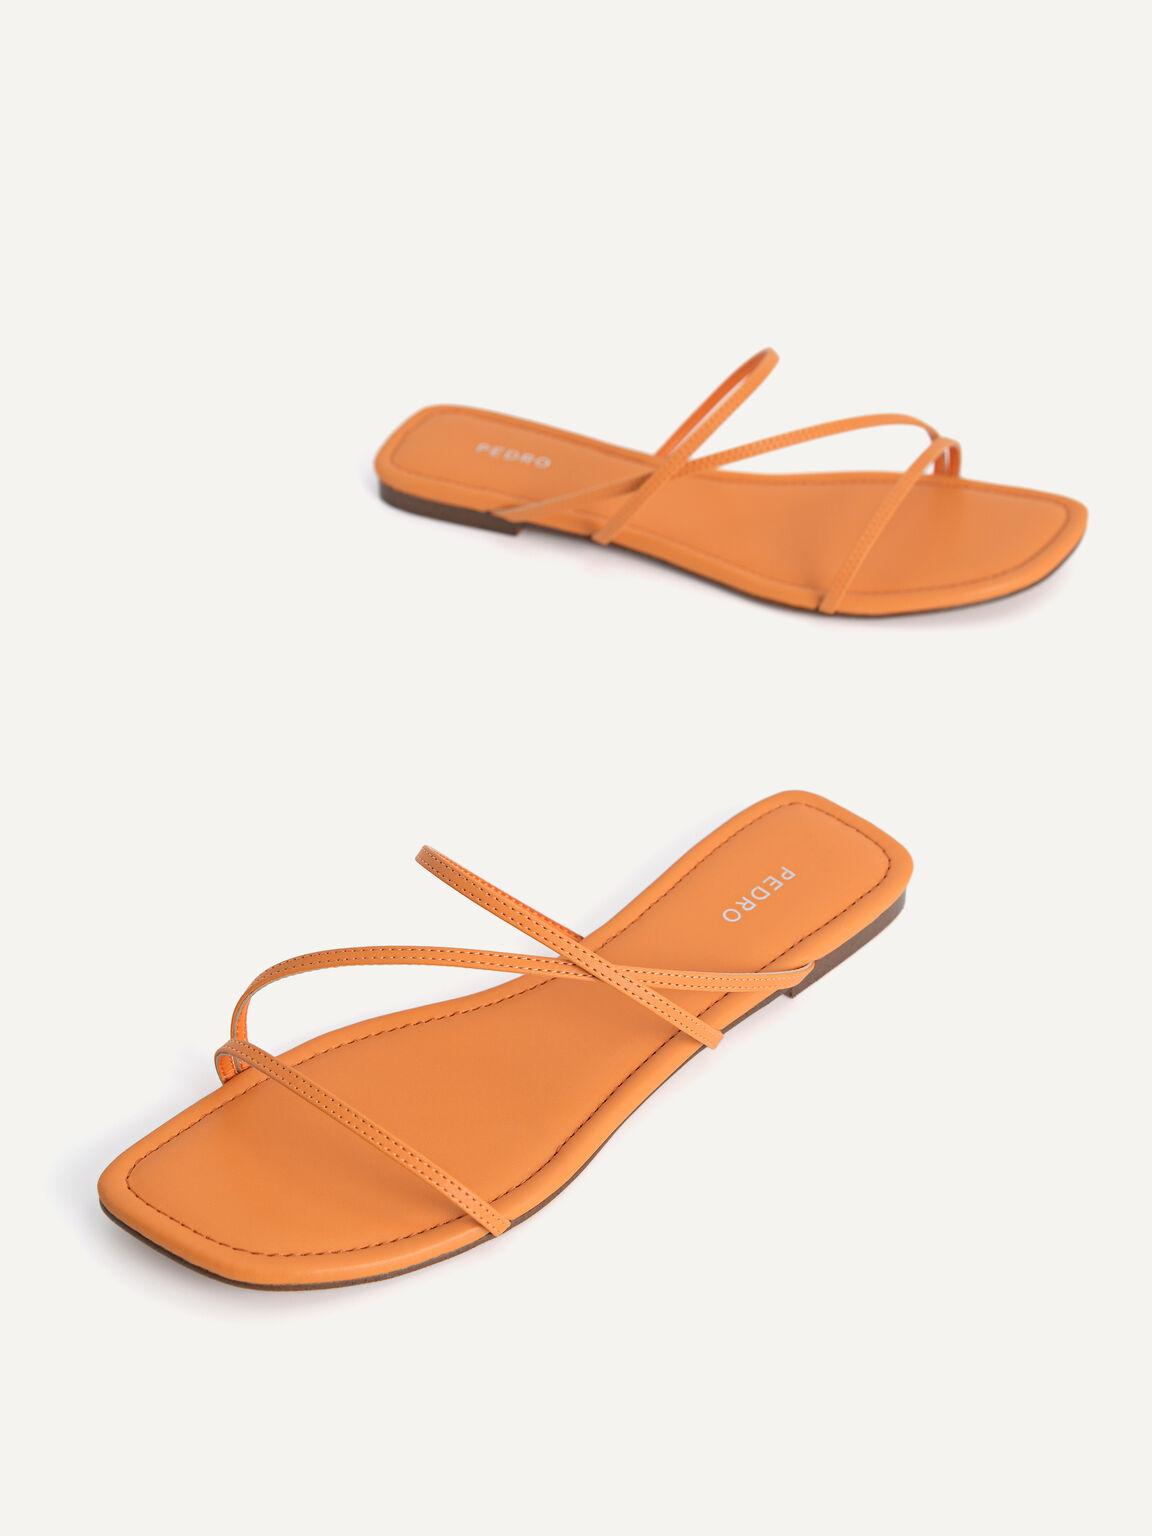 Strappy Flats, Orange, hi-res